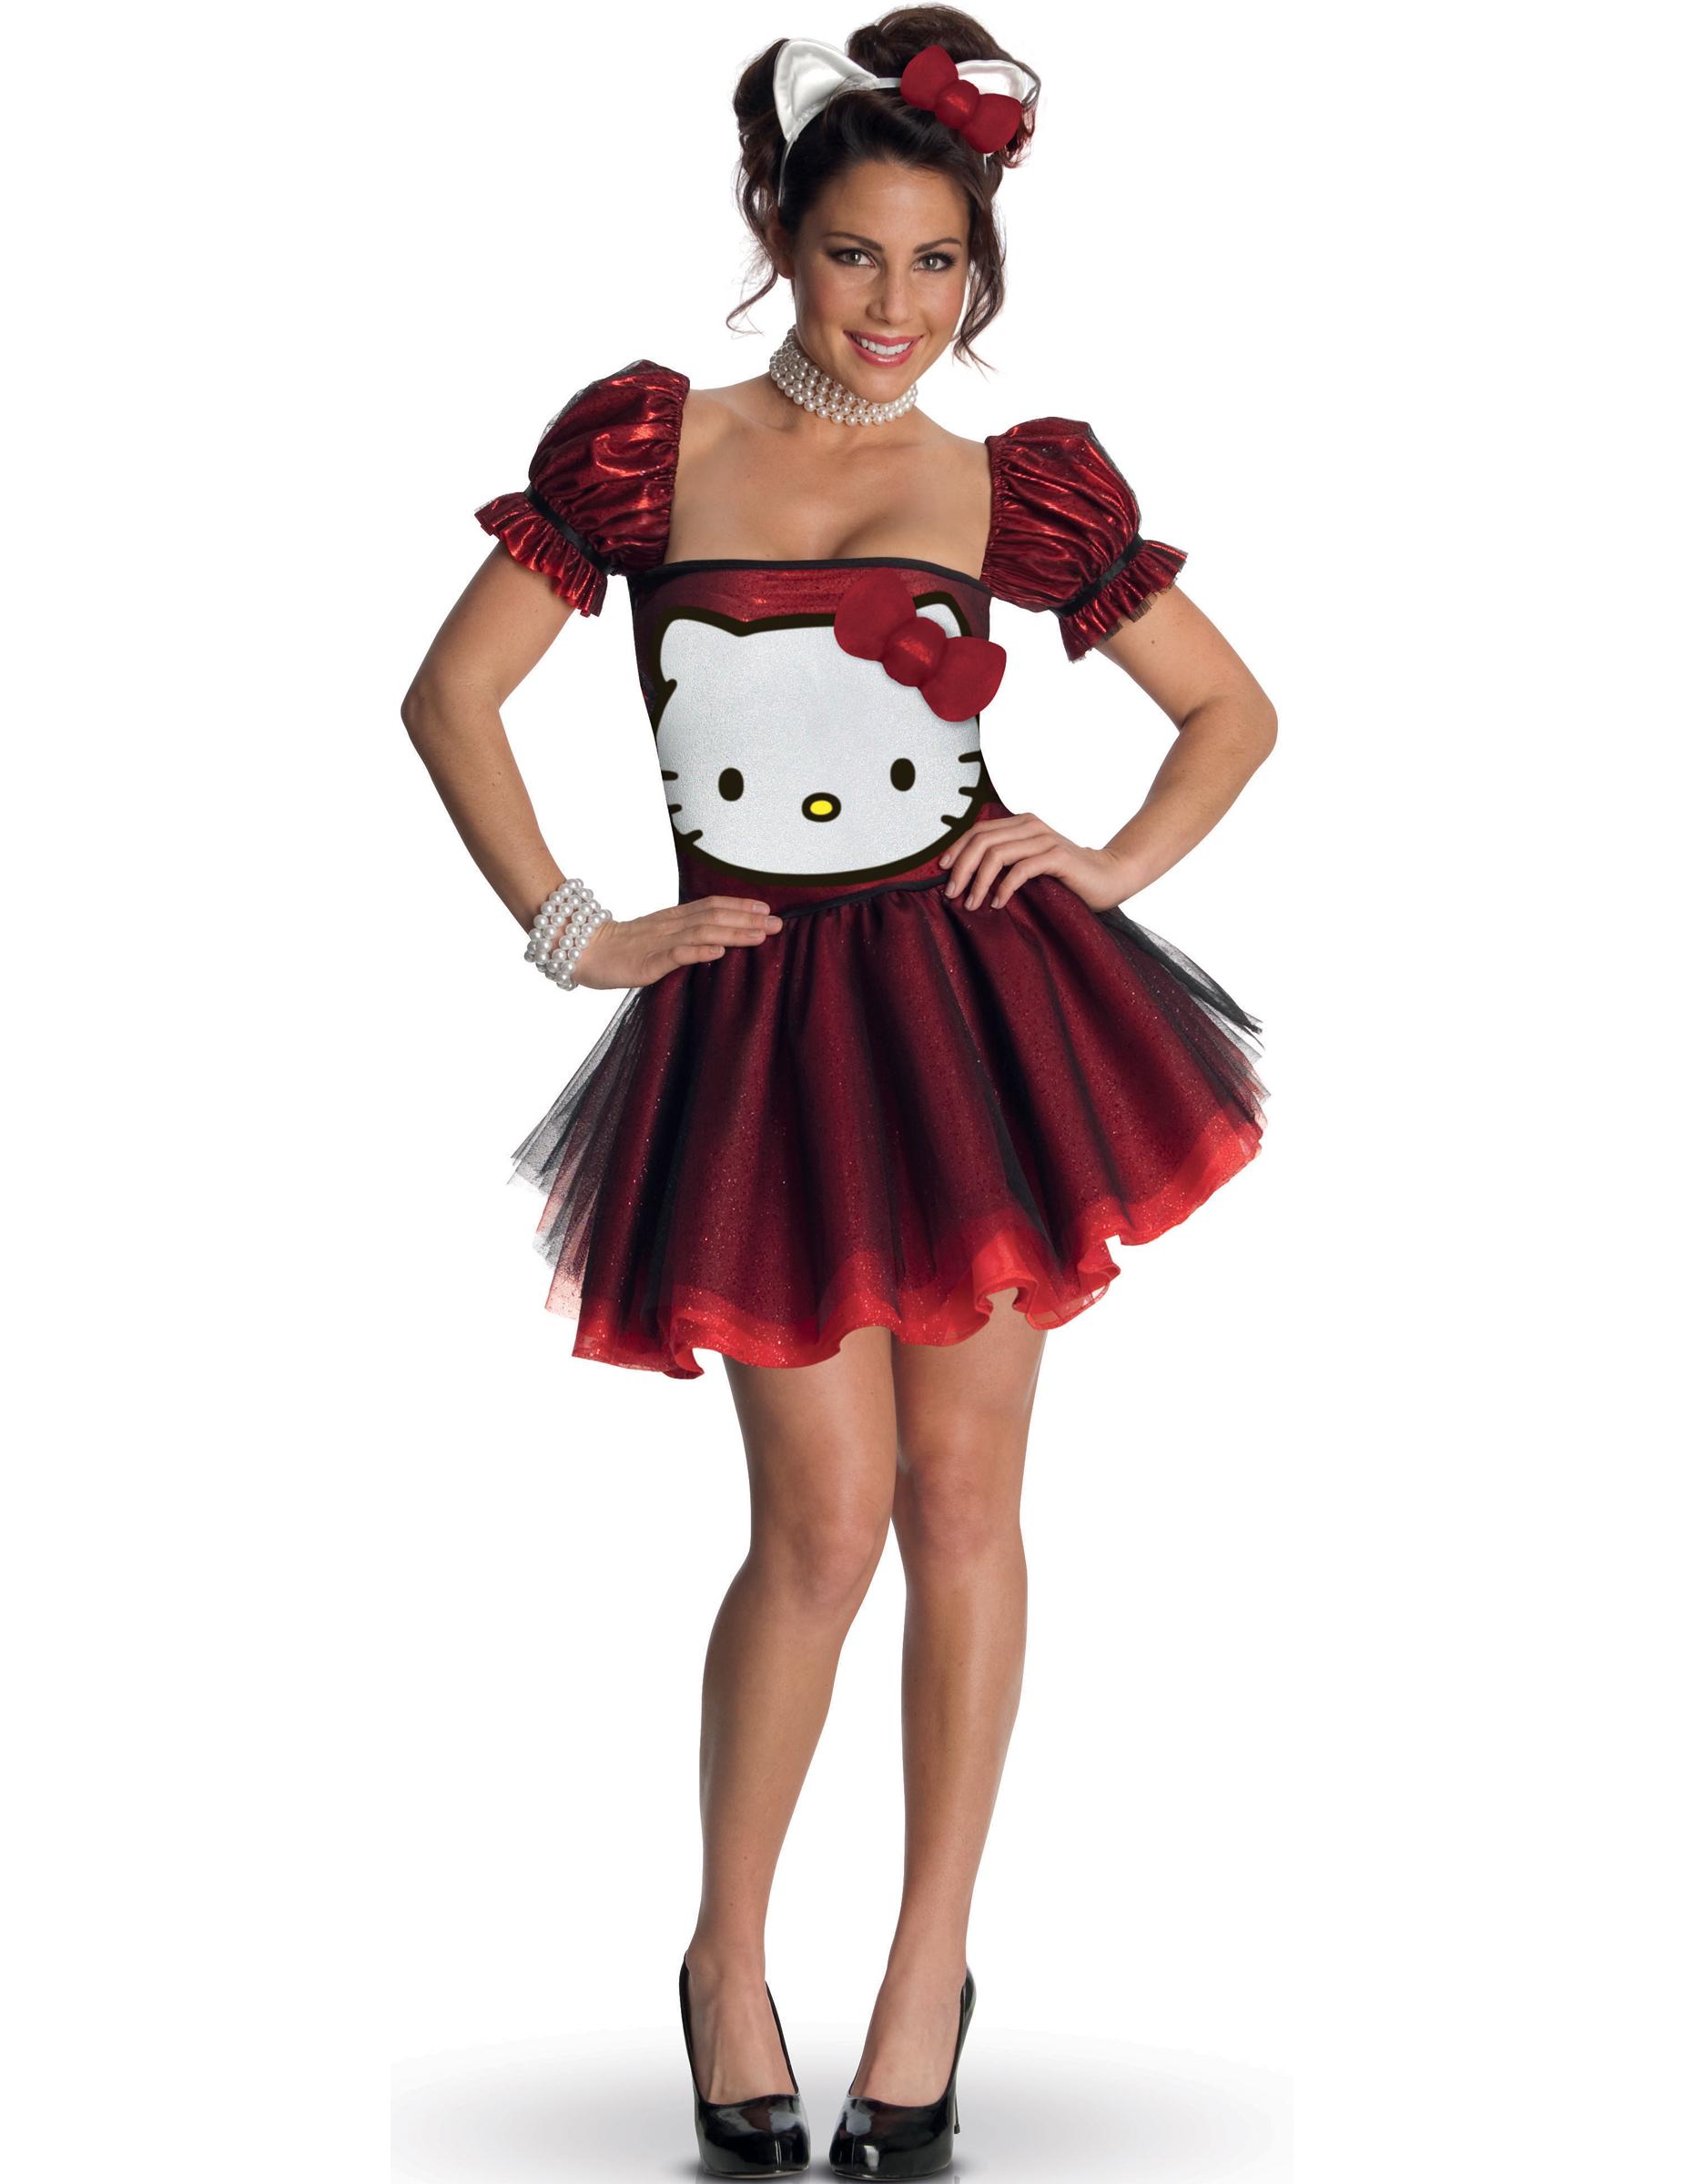 déguisement adulte hello kitty